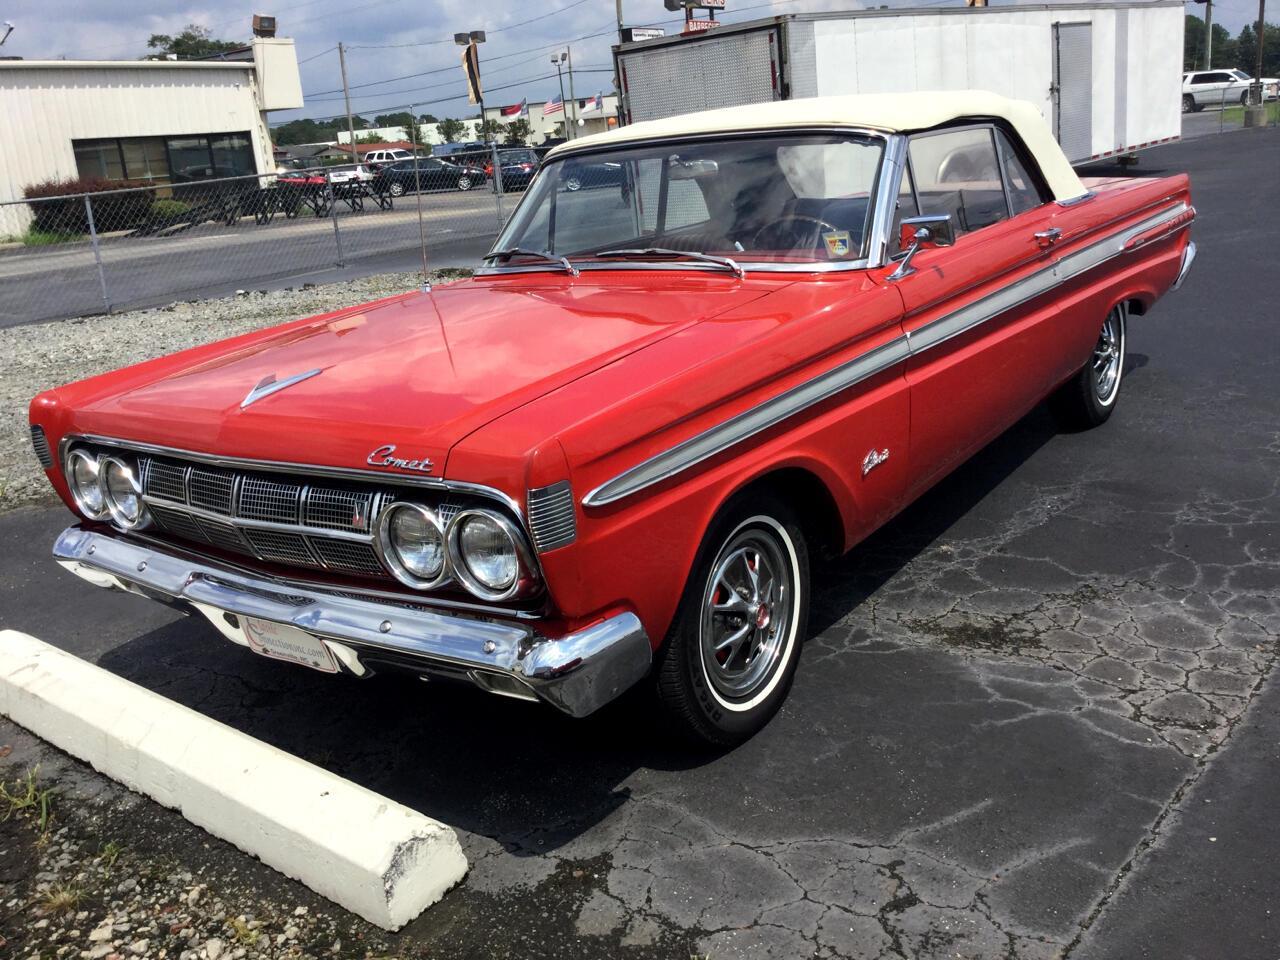 1964 Mercury Convertible (CC-1439152) for sale in Greenville, North Carolina